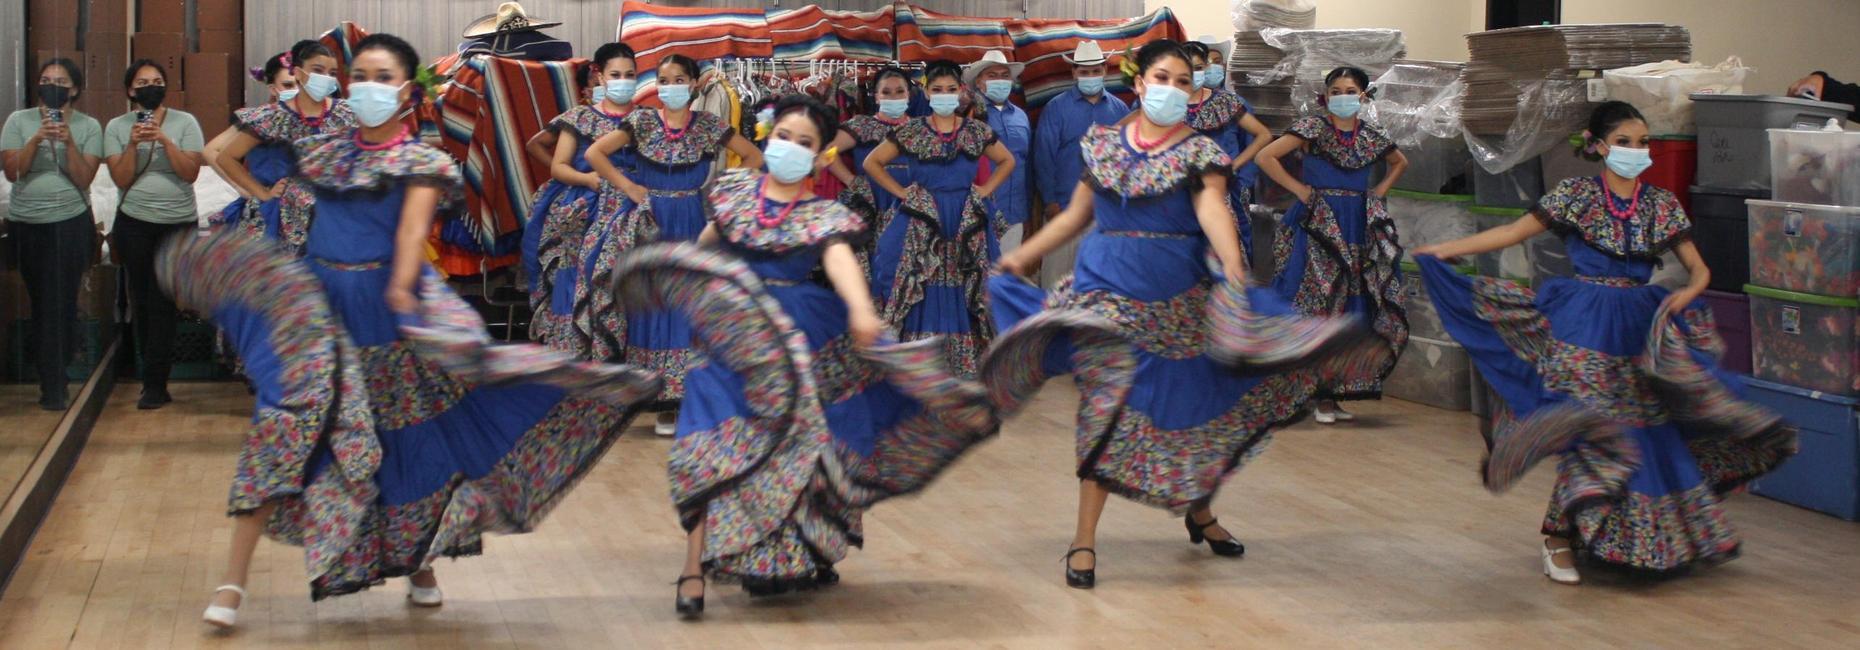 balet de folklorico